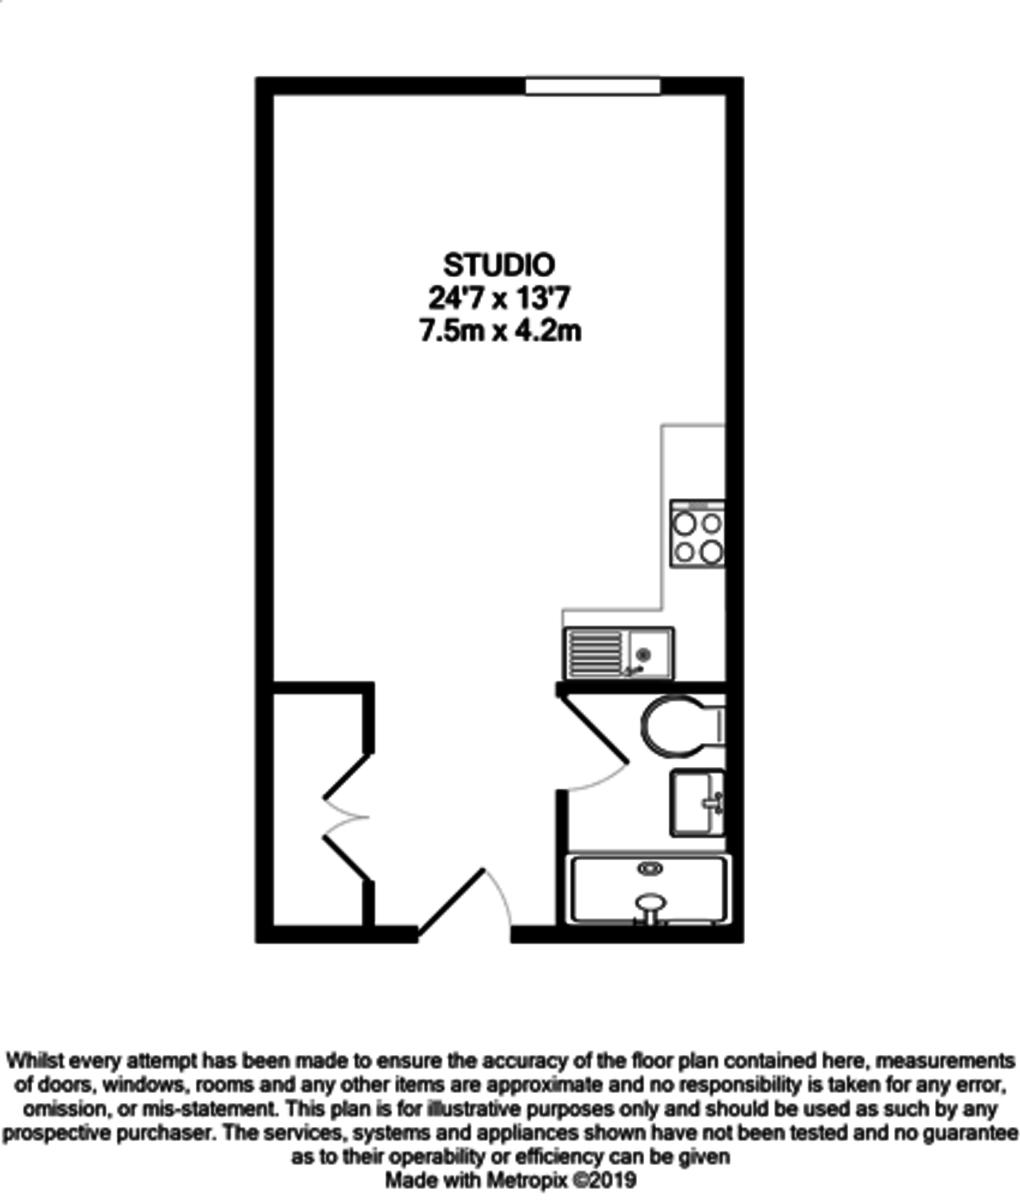 Sinope Apartments, 58 Sherborne Street, Birmingham City Centre floorplan 1 of 1